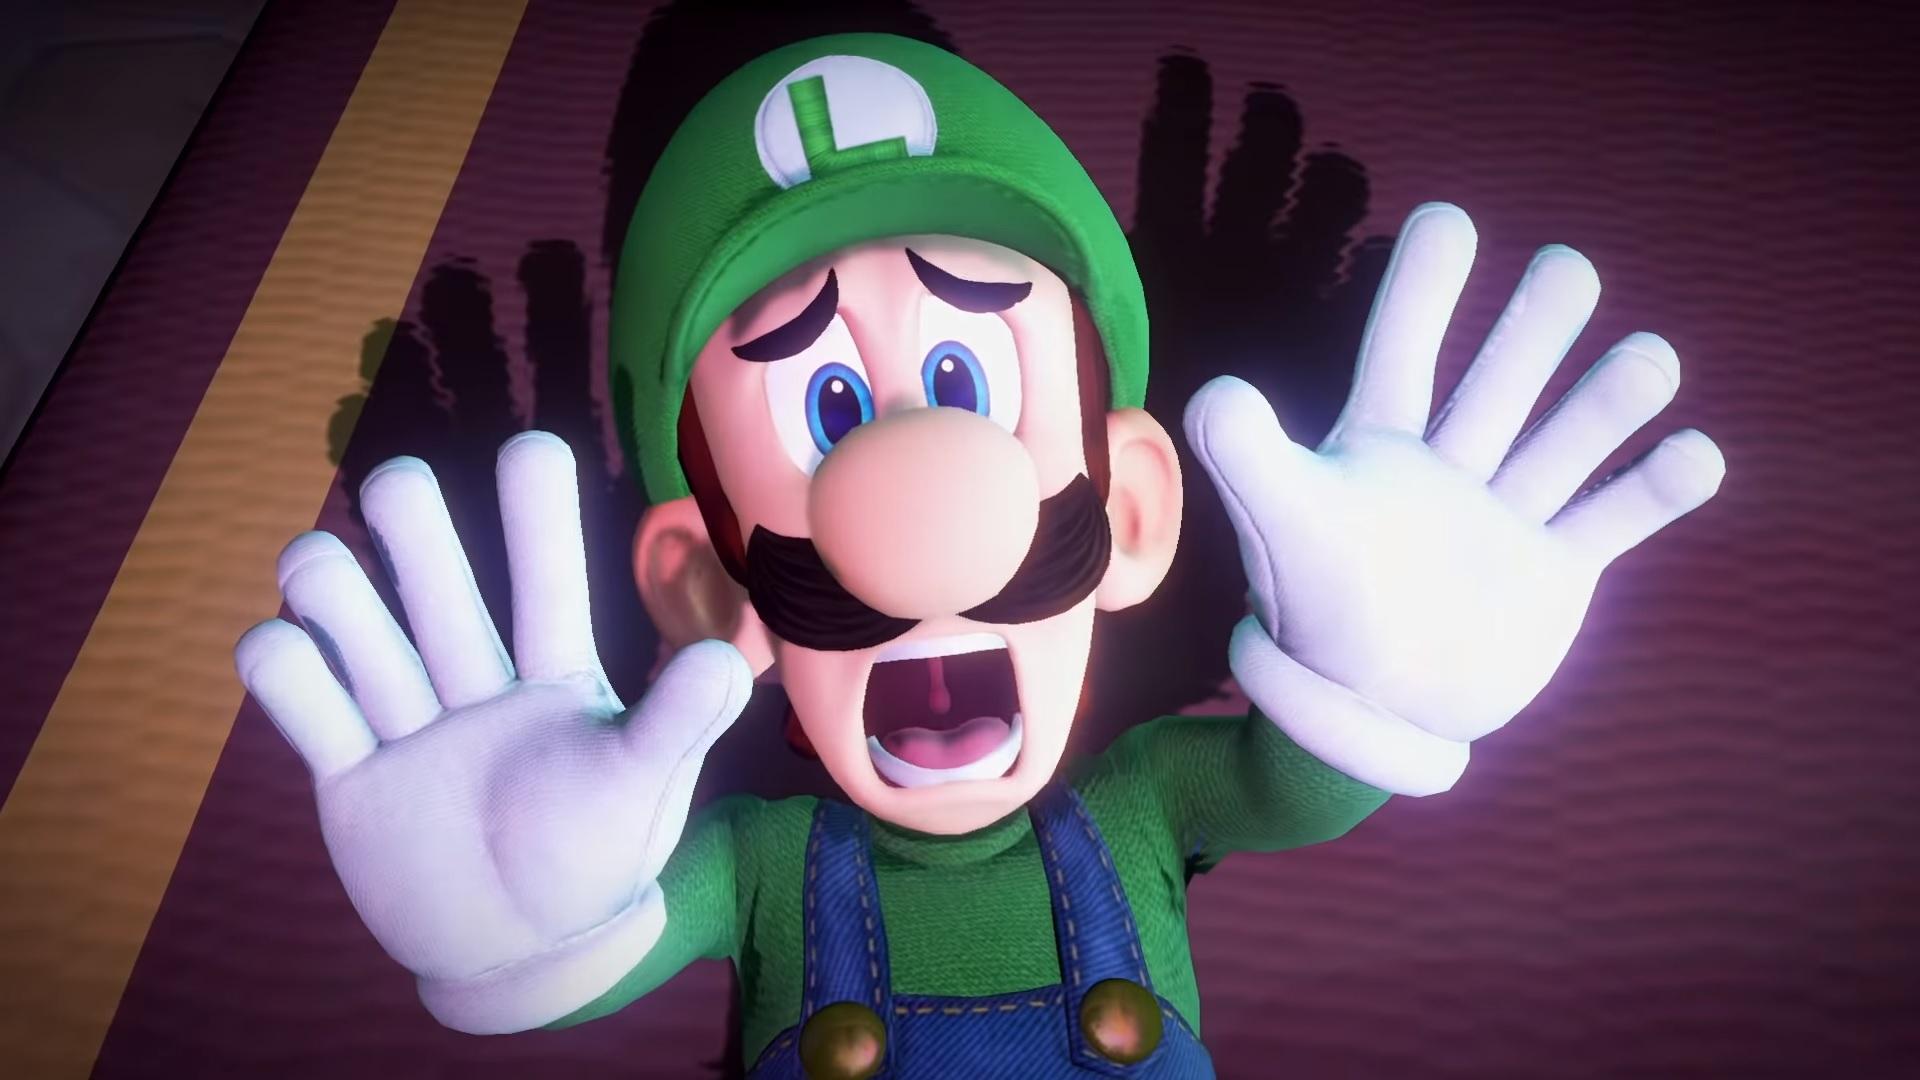 Luigis Mansion 3 Review